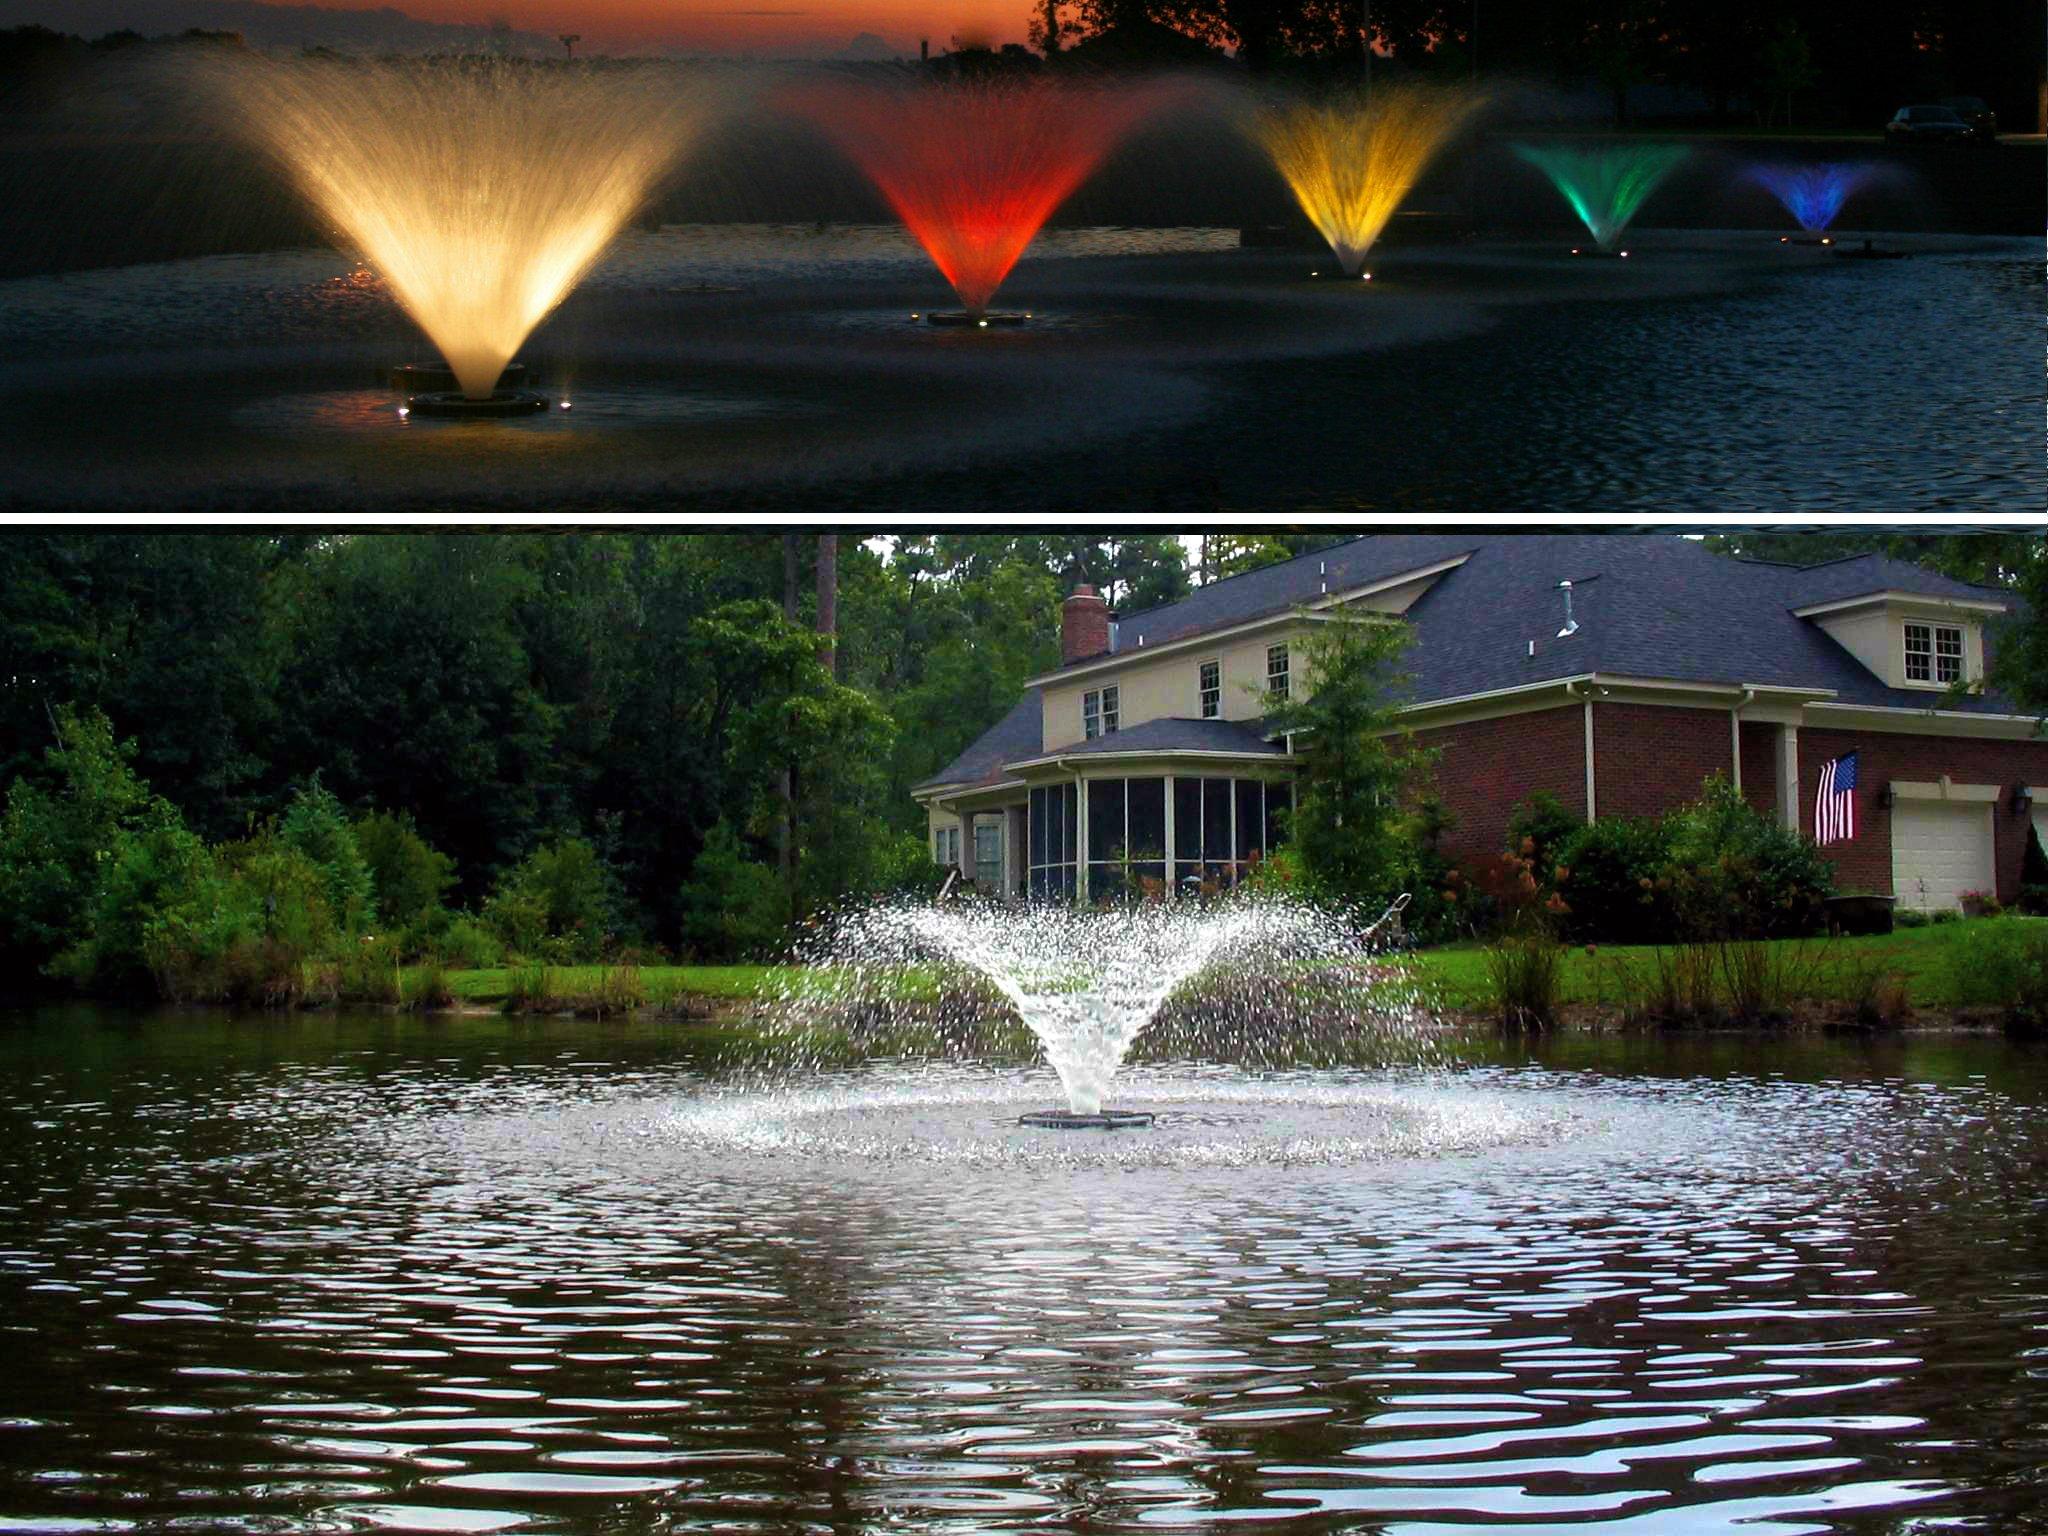 Kasco Decorative Aerating Lake & Pond Fountain WITH LIGHT KIT - 1/2 HP by Kasco Marine